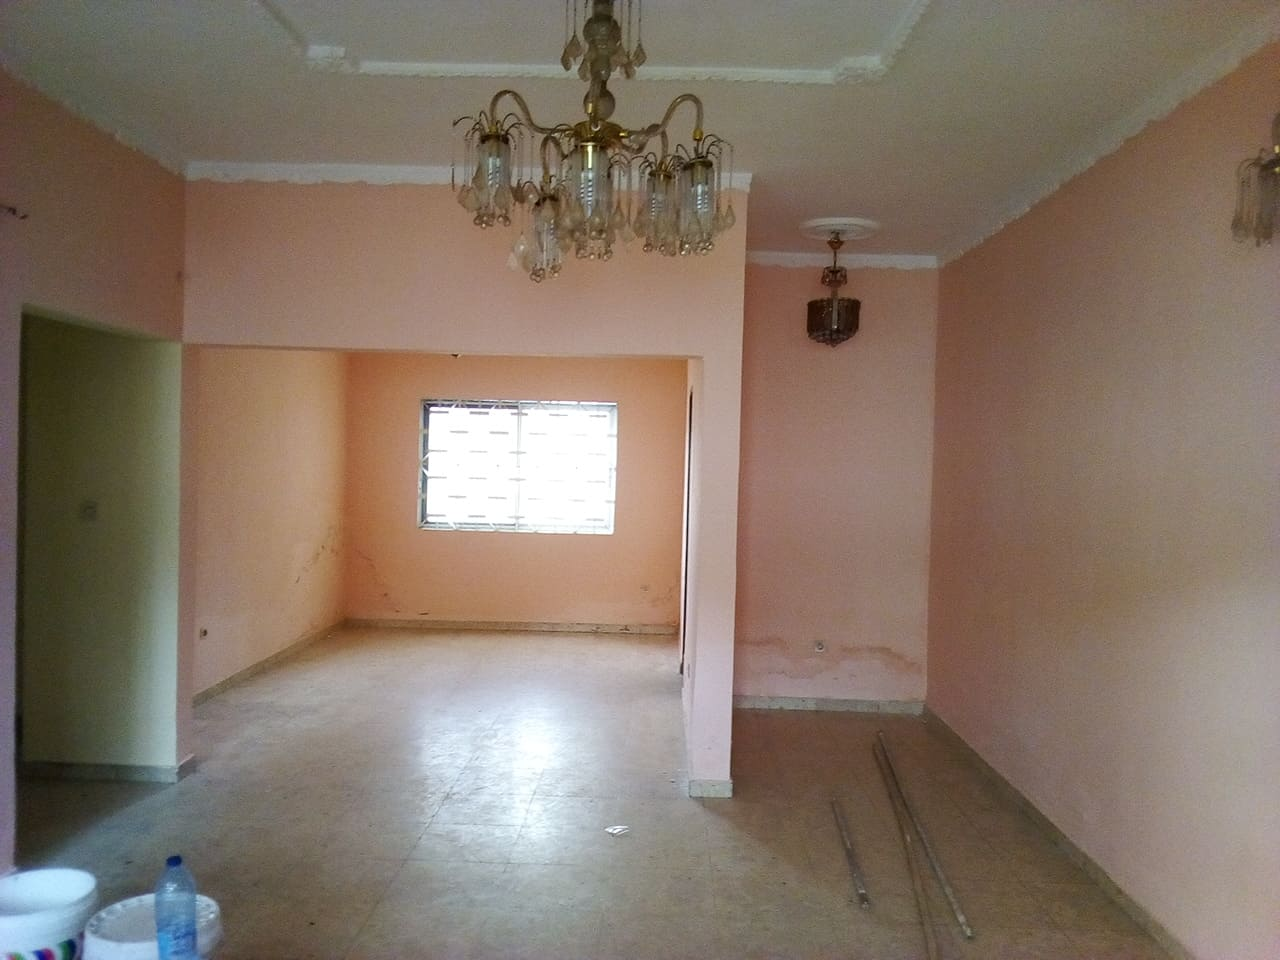 Apartment to rent - Yaoundé, Bastos, pas loin du pnud - 1 living room(s), 3 bedroom(s), 3 bathroom(s) - 450 000 FCFA / month